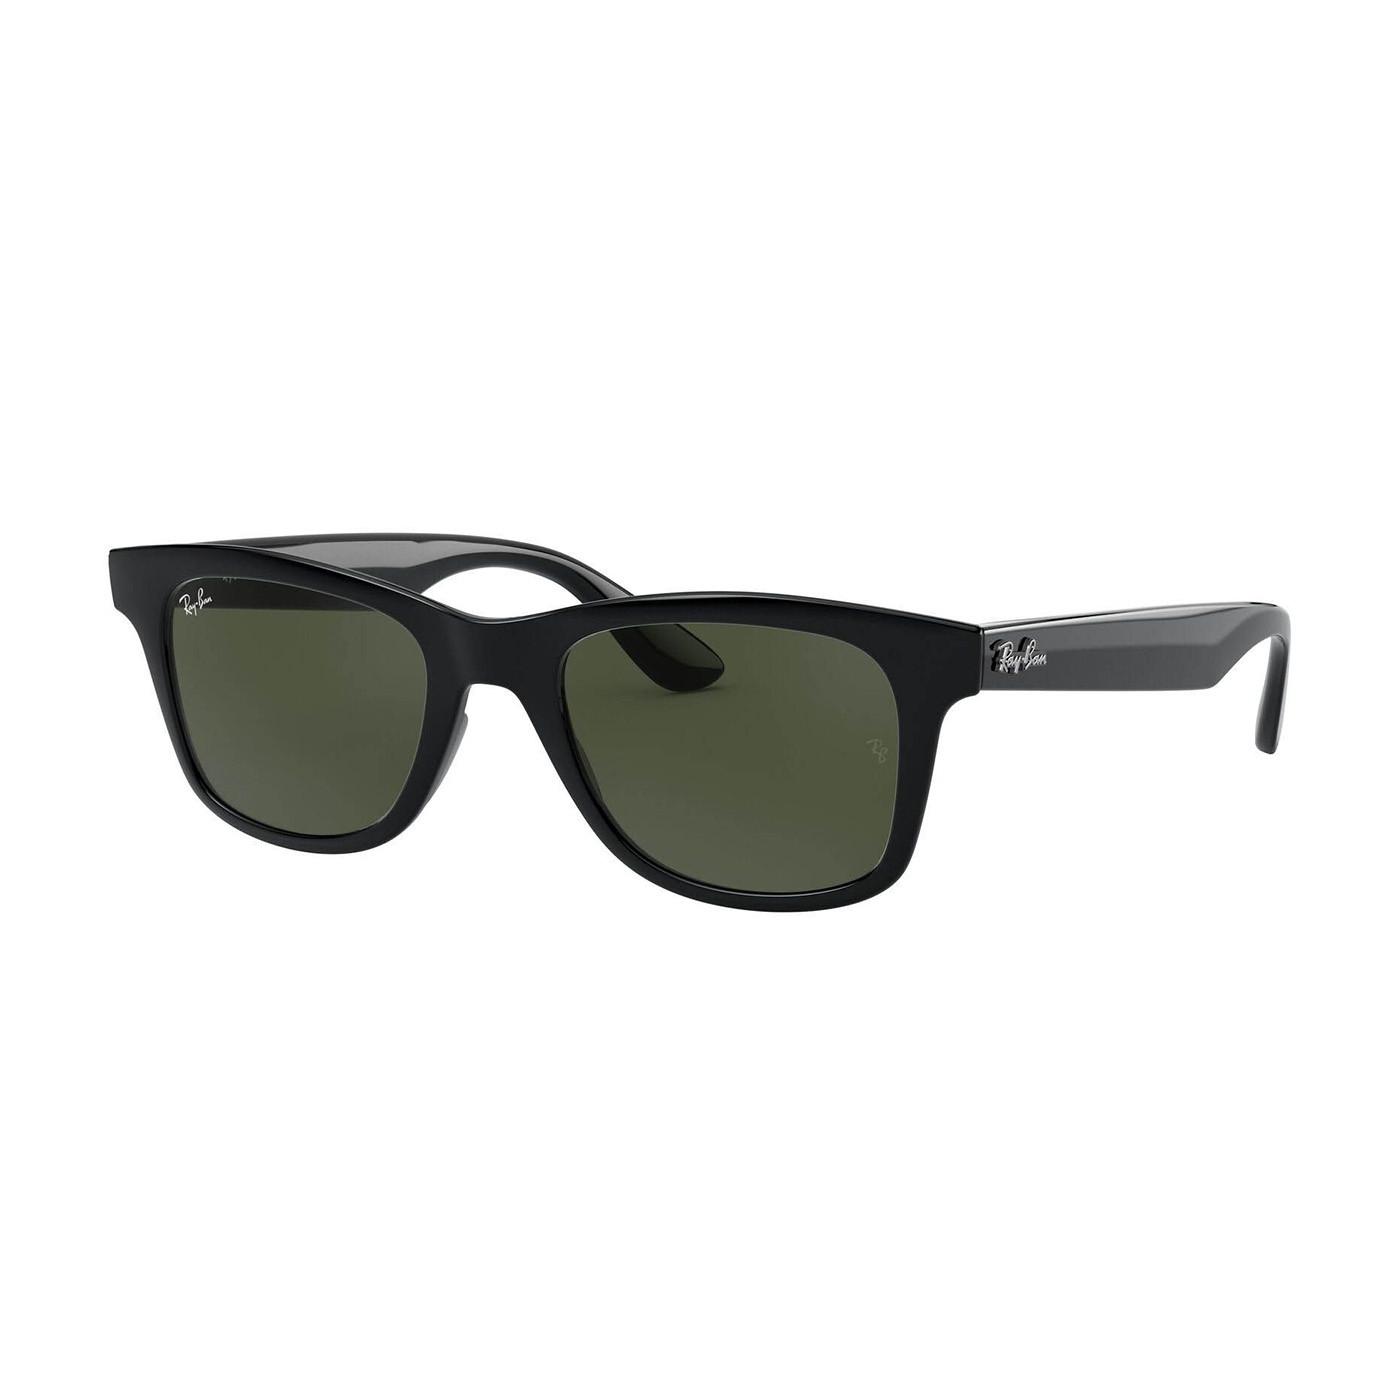 Ray Ban Highstreet Shiny Black Zonnebril Rb46405060131 Sunglasses